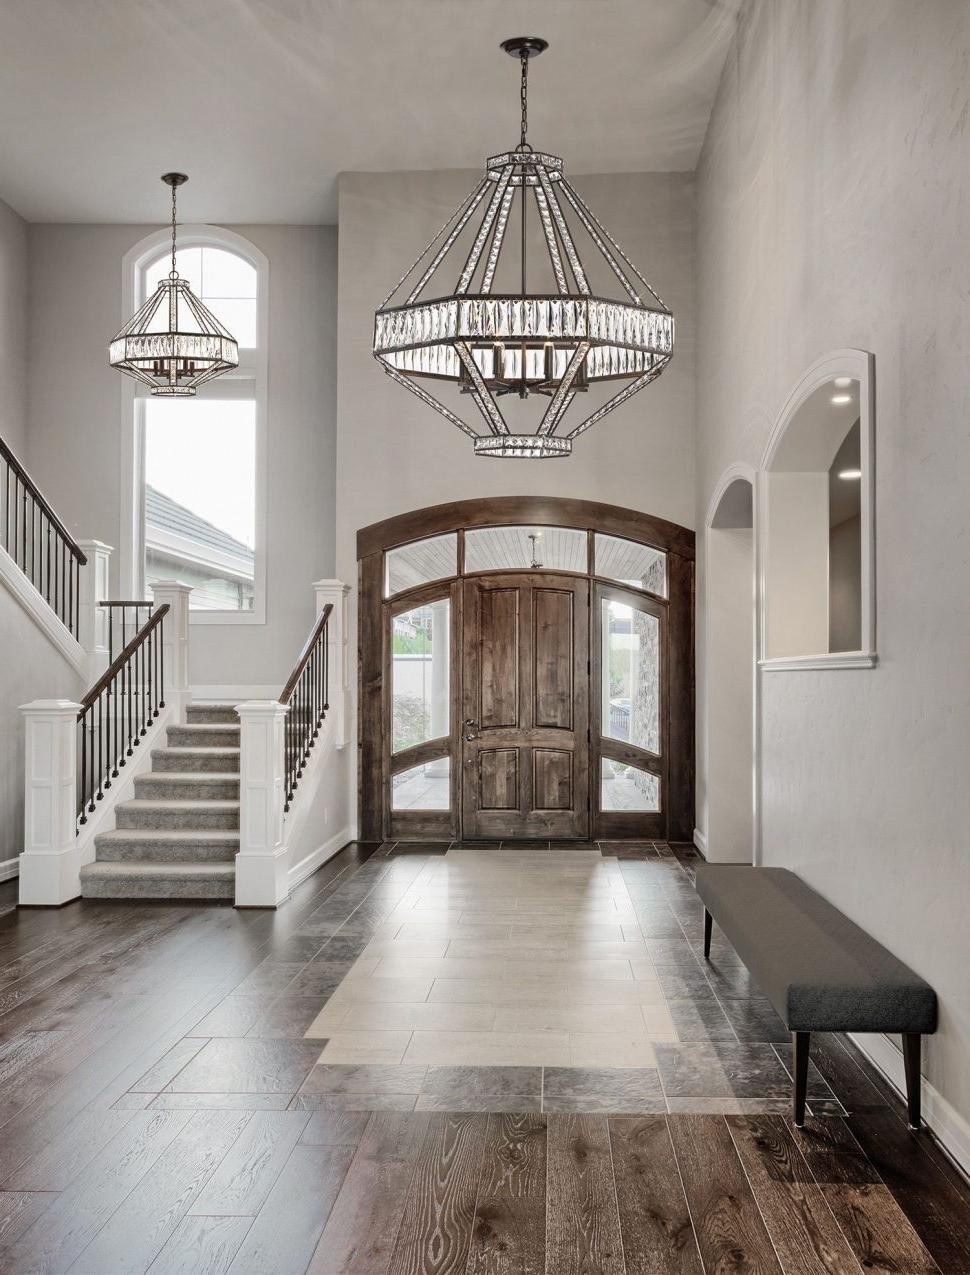 Hallway Chandeliers In Current Chandeliers : Modern Hallway Chandeliers Ideas Best Photo Design (View 6 of 20)